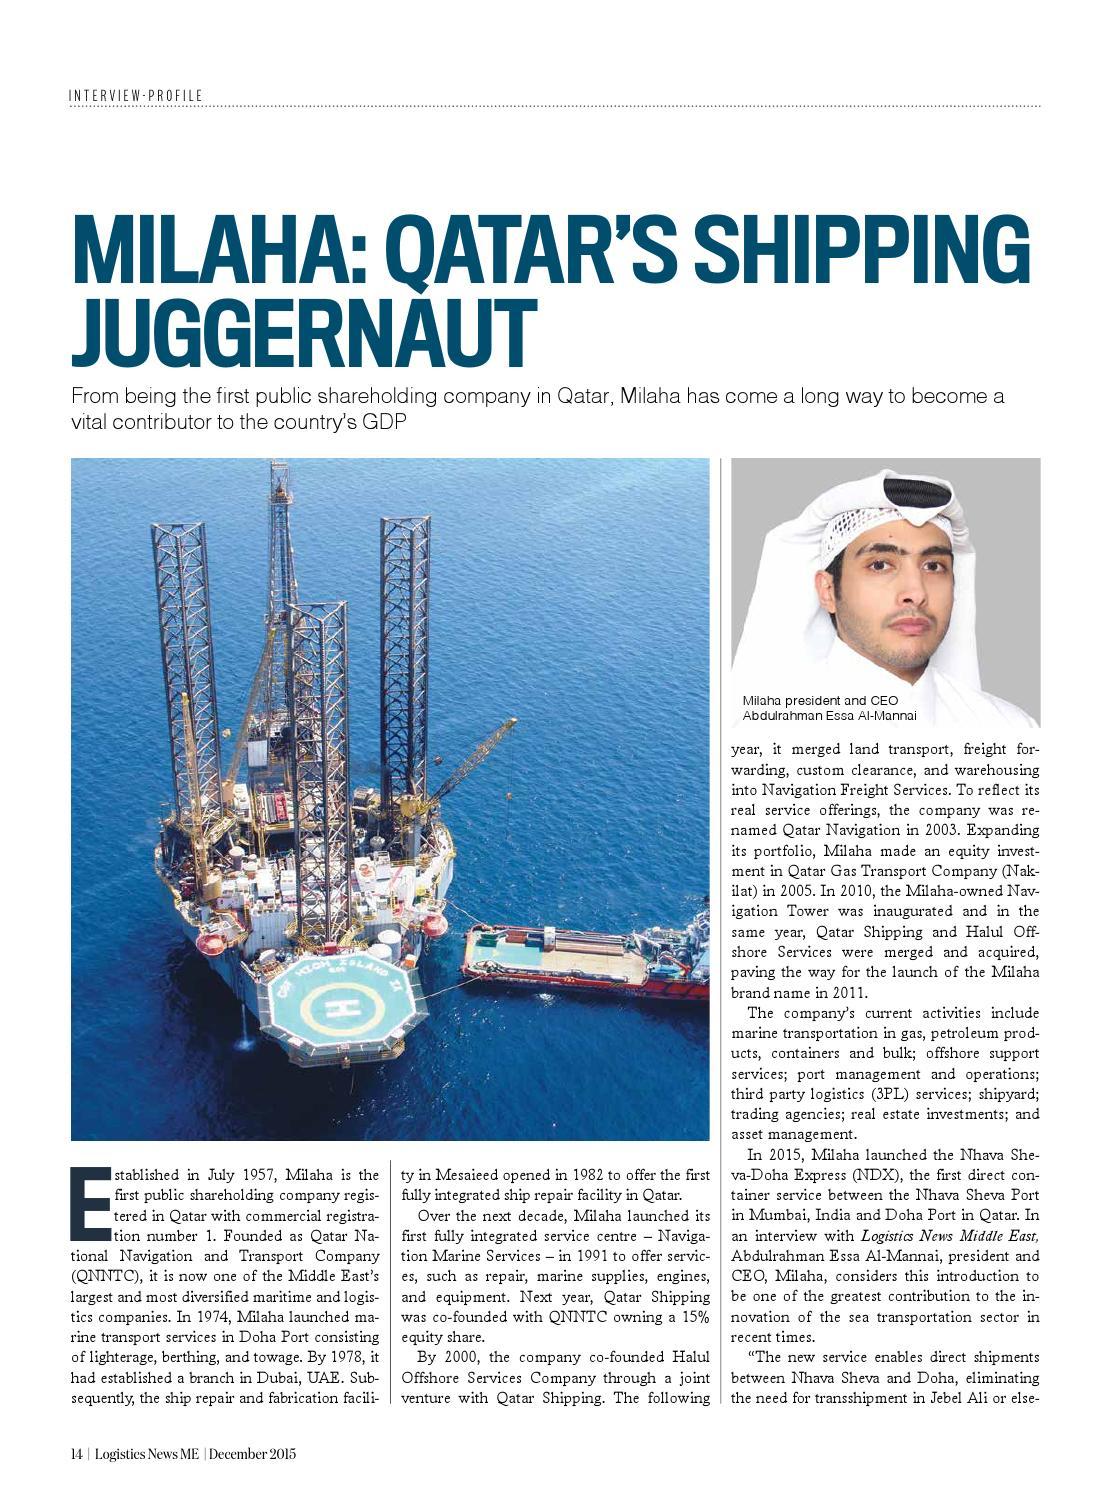 Logistics News ME - December 2015 by BNC Publishing - issuu